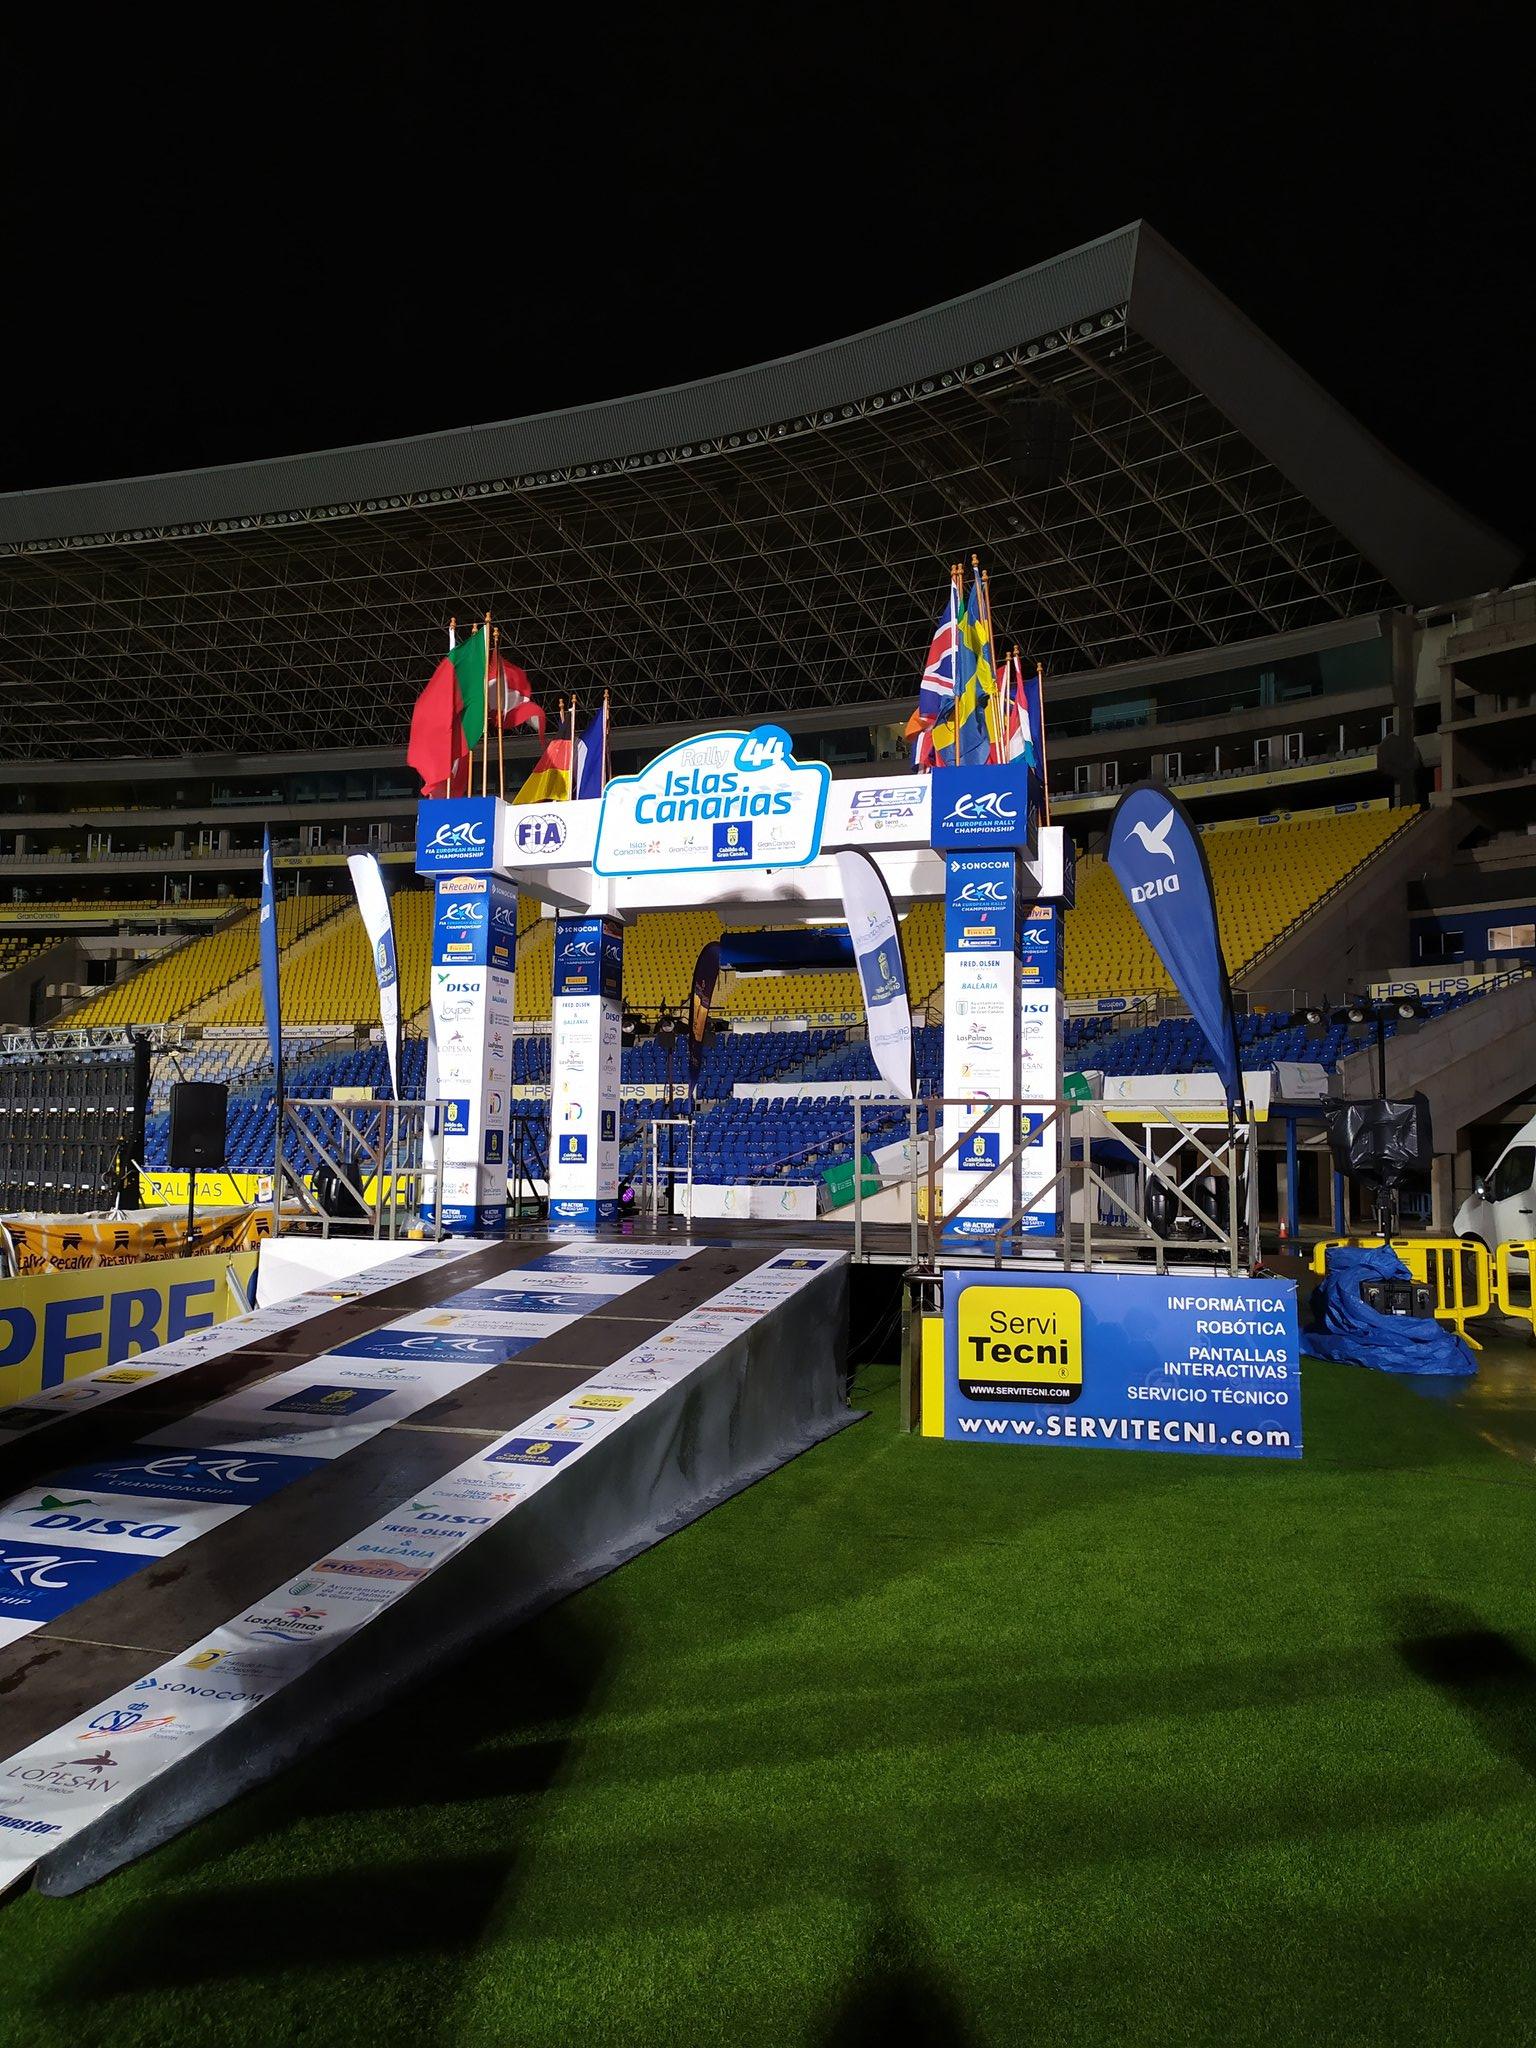 ERC + SCER + CERA: 44º Rallye Islas Canarias [26-28 Noviembre] - Página 3 EnxrqRjXIAABSac?format=jpg&name=large